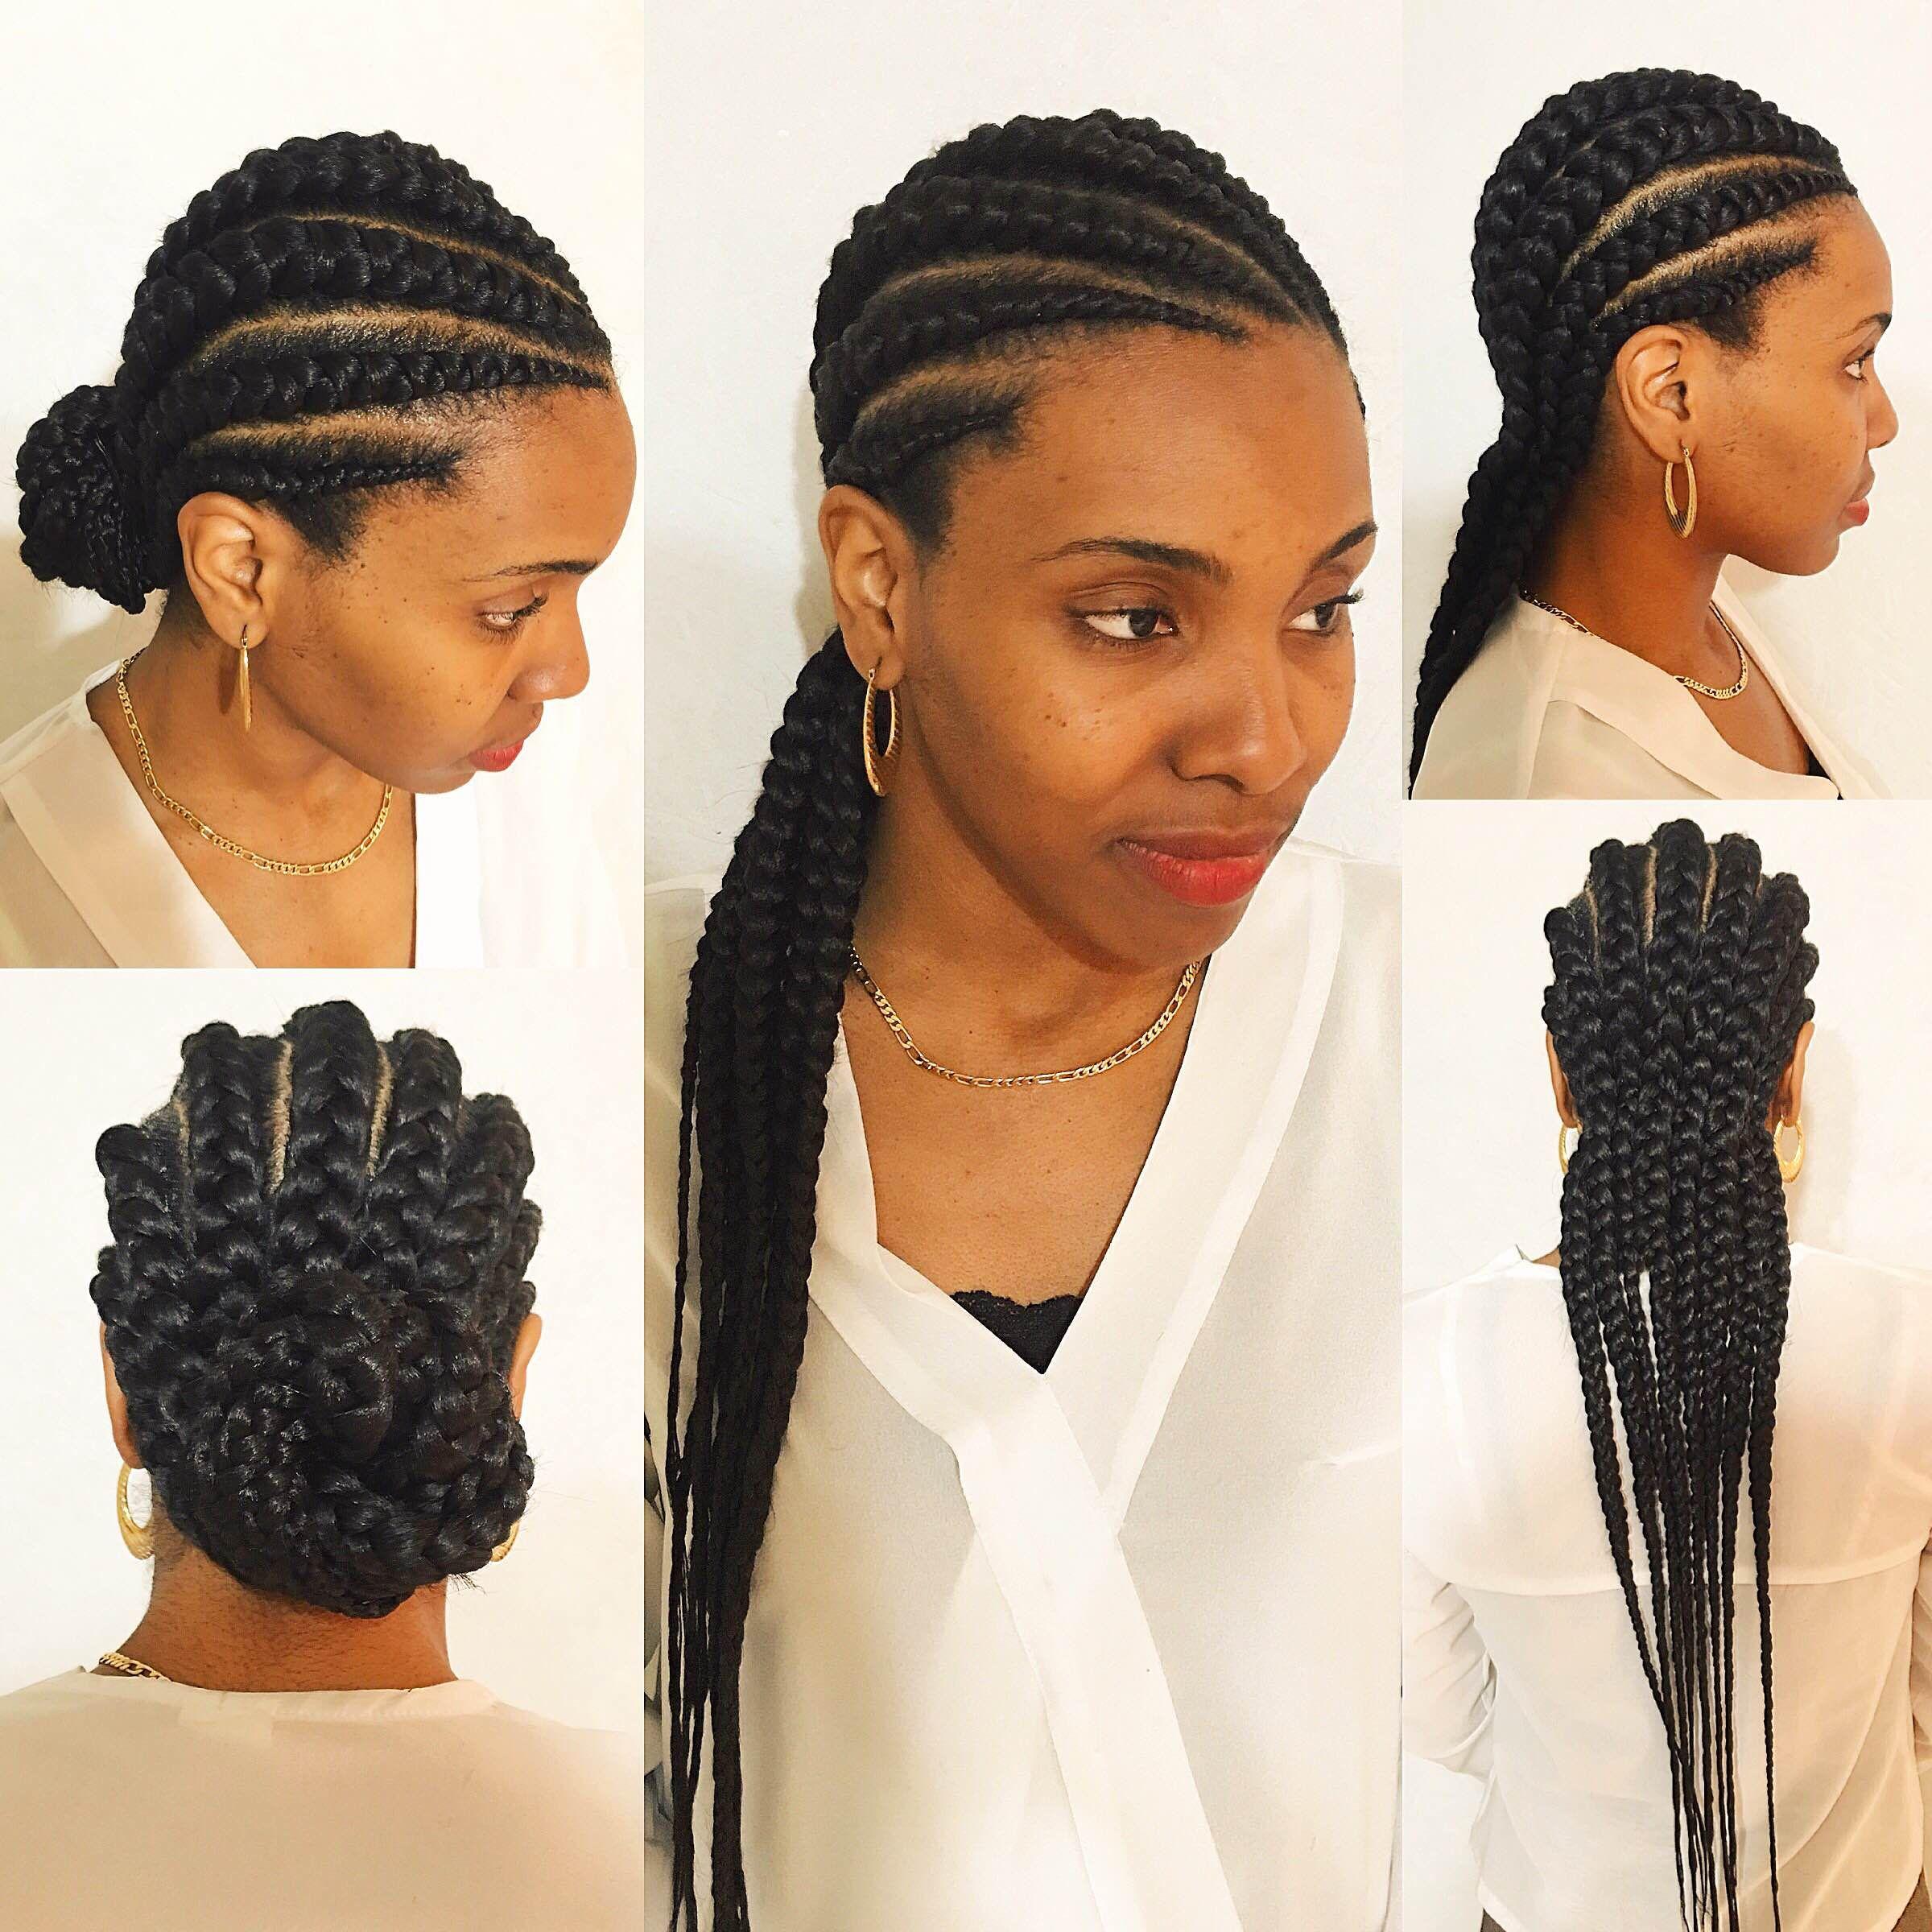 5 Dependable Wedding Hairstyles For Black Women At 30: Meet My Hairstylist Darlynda